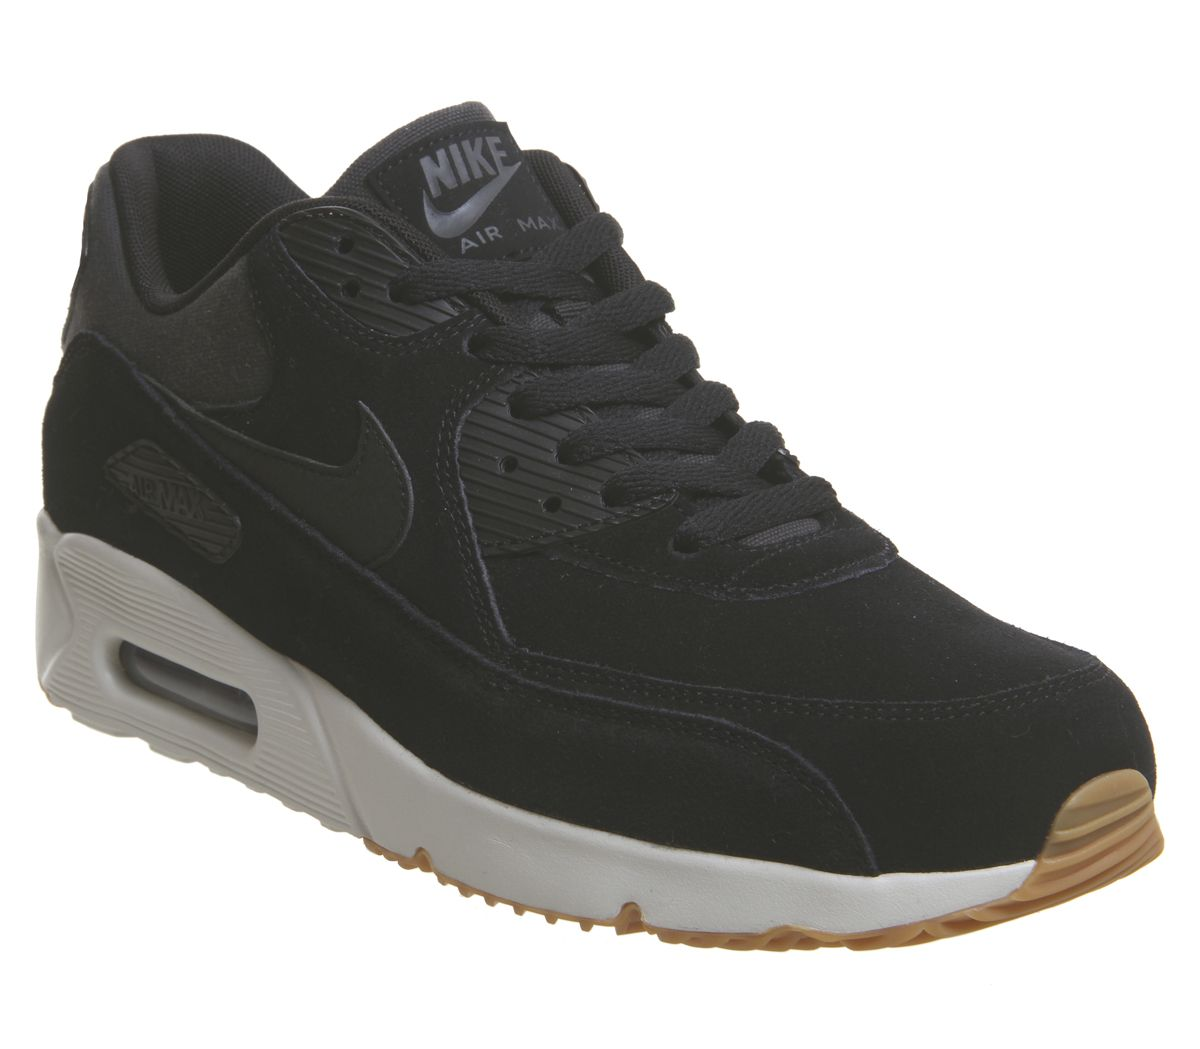 2e23c025 Nike Air Max 90 Ultra 2.0 Trainers Black Light Bone Gum - His trainers